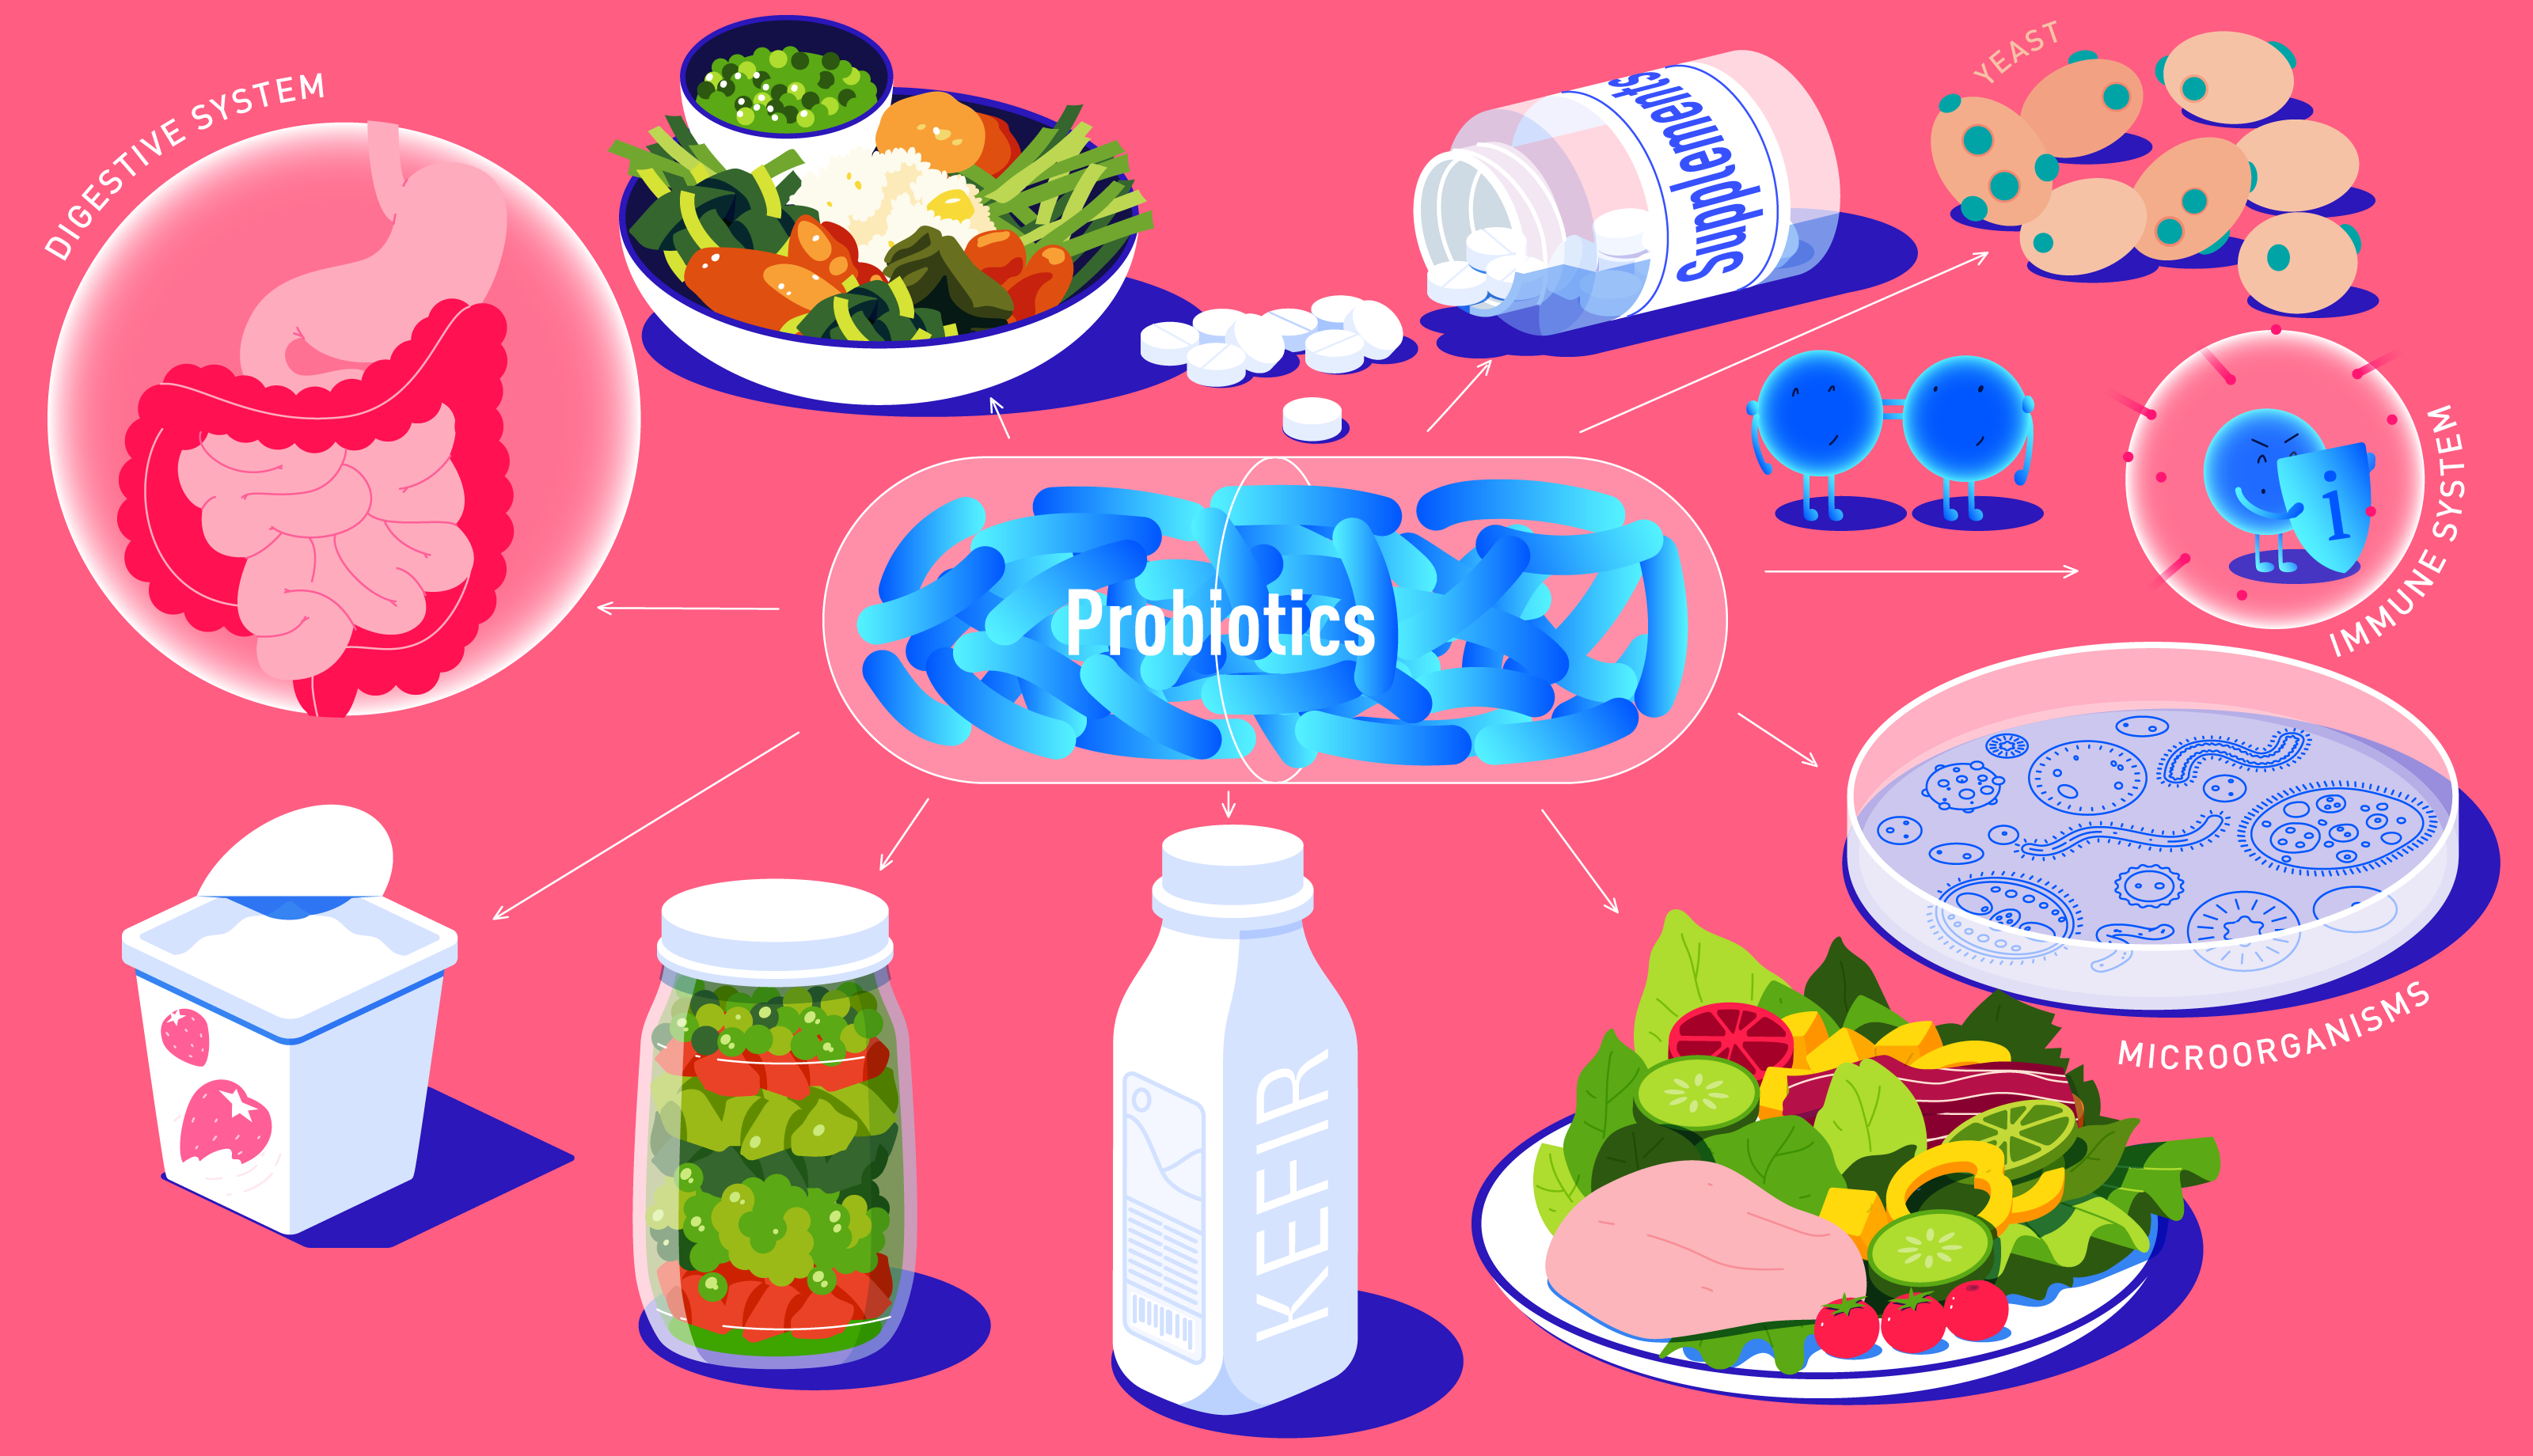 2020-10-08-2--Probiotics-for-IBS-201013-